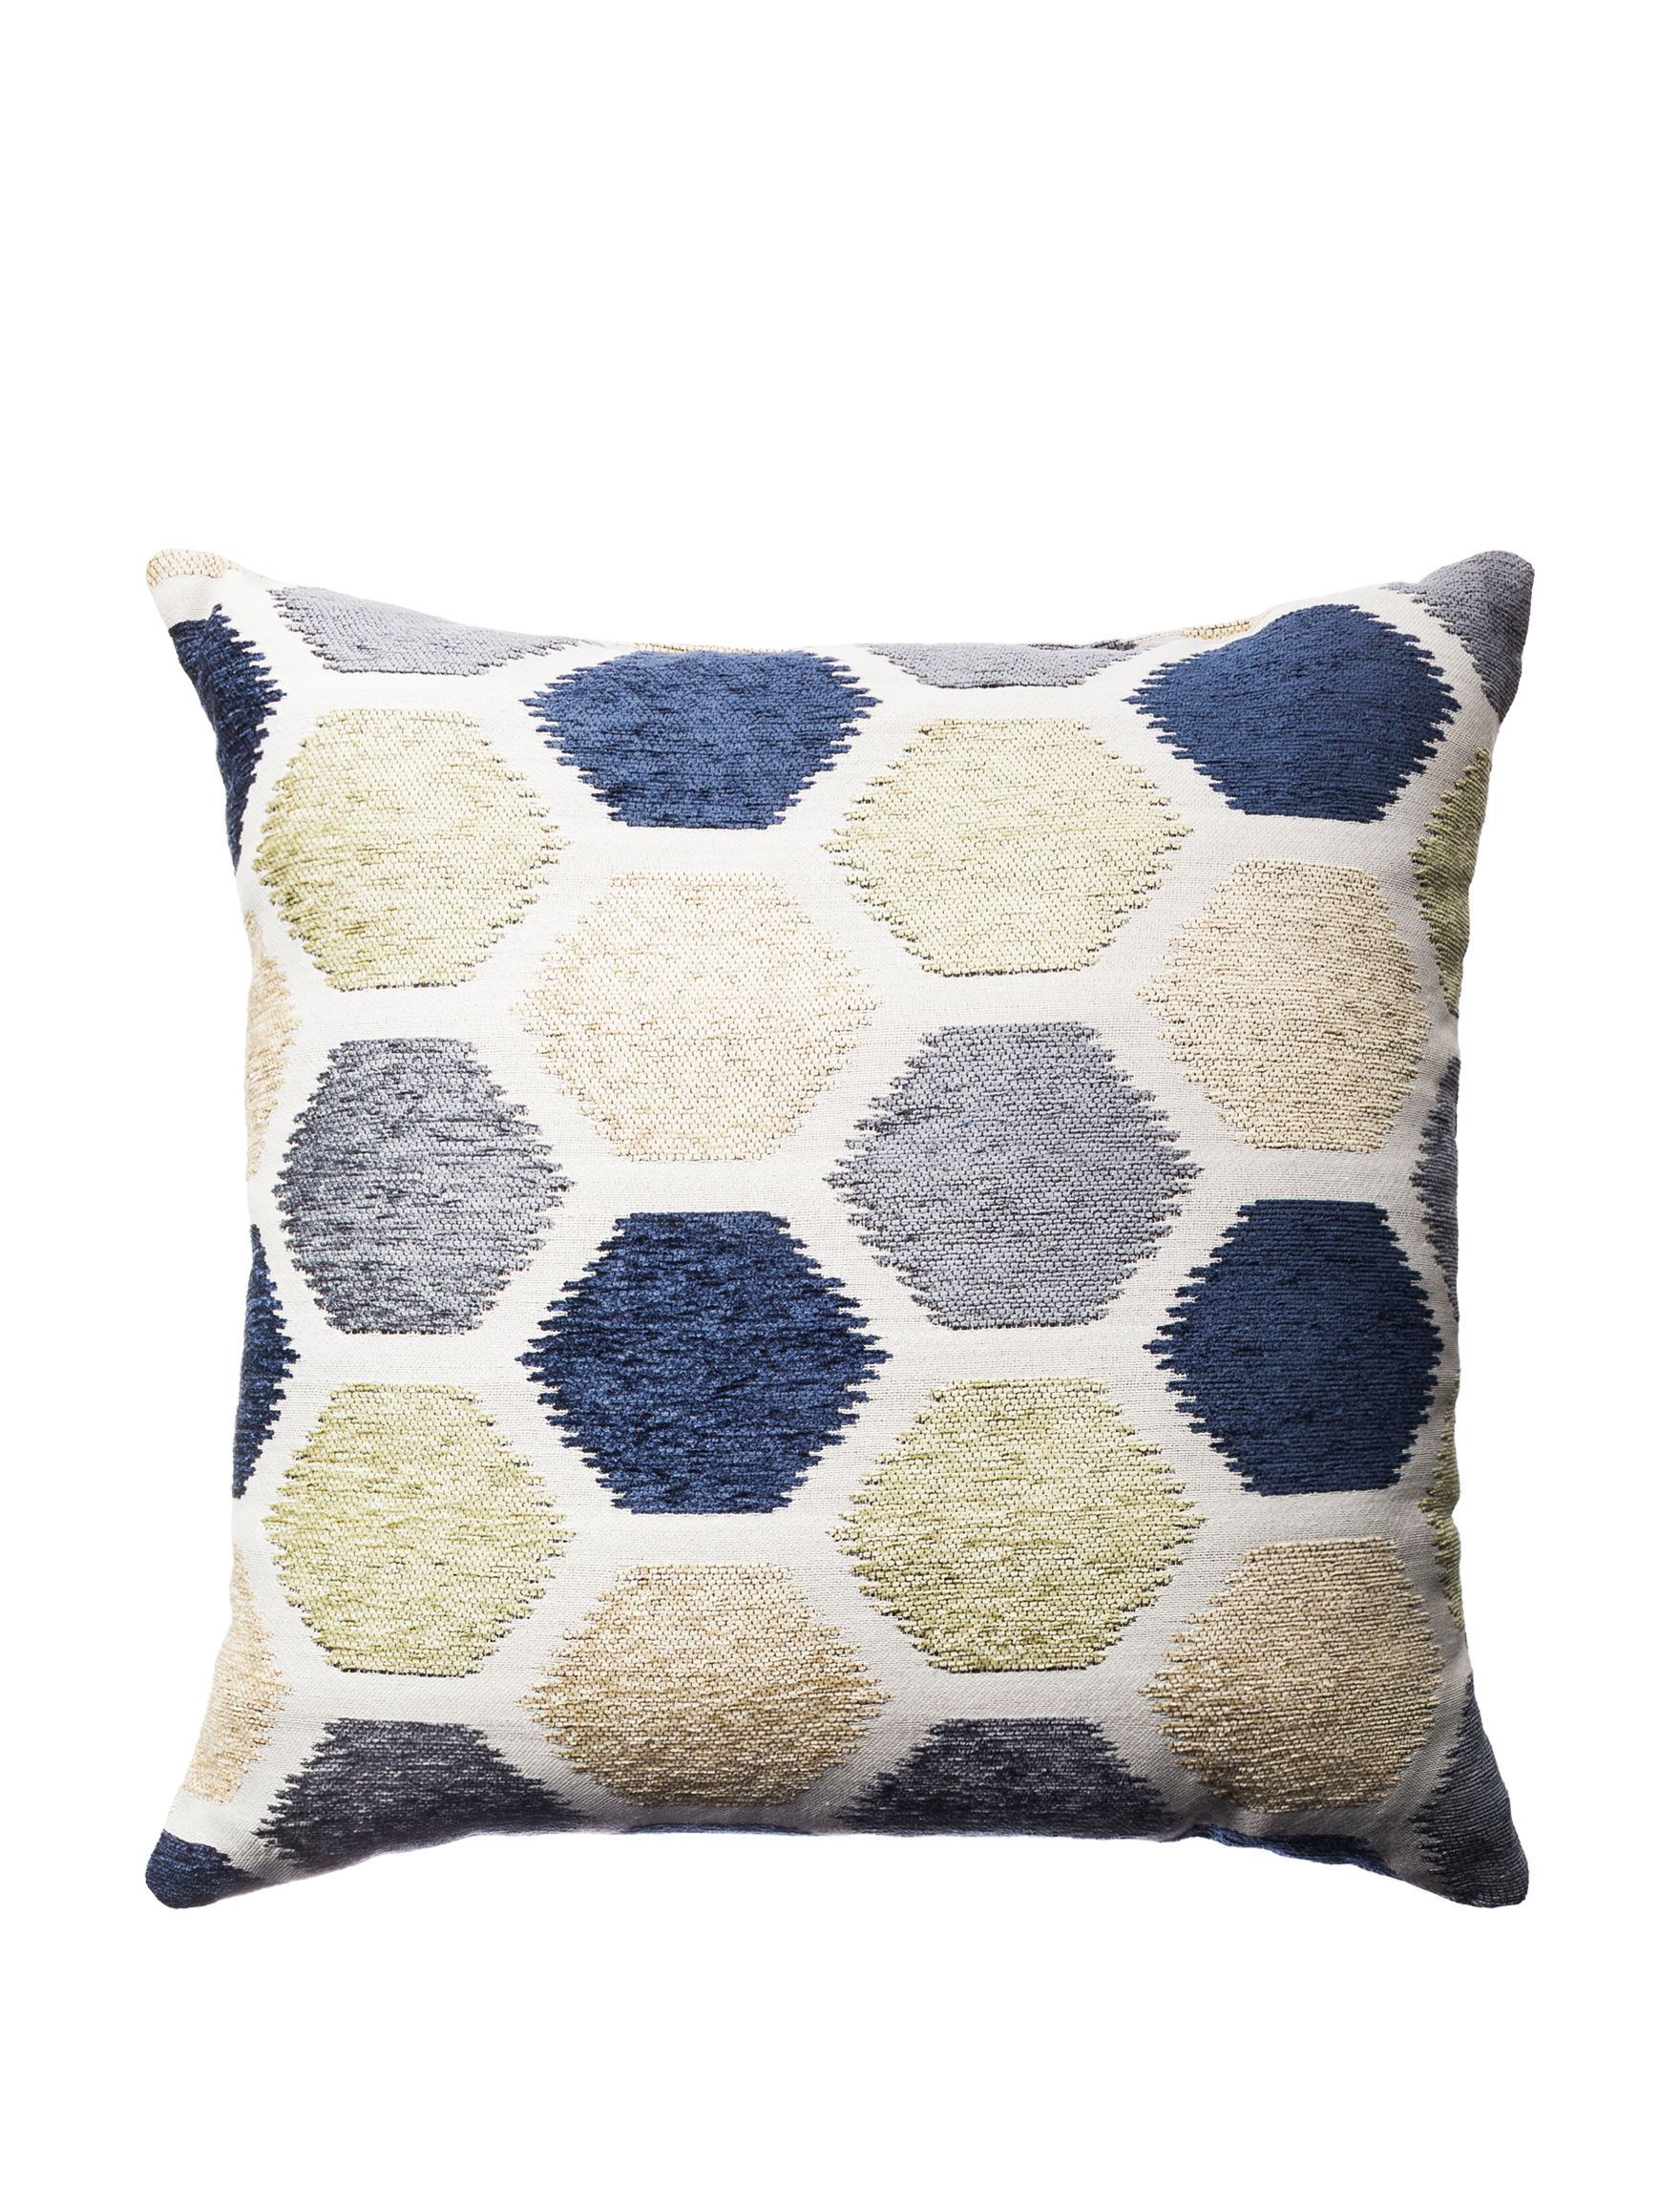 Home Fashions International Indigo Decorative Pillows Outdoor Decor